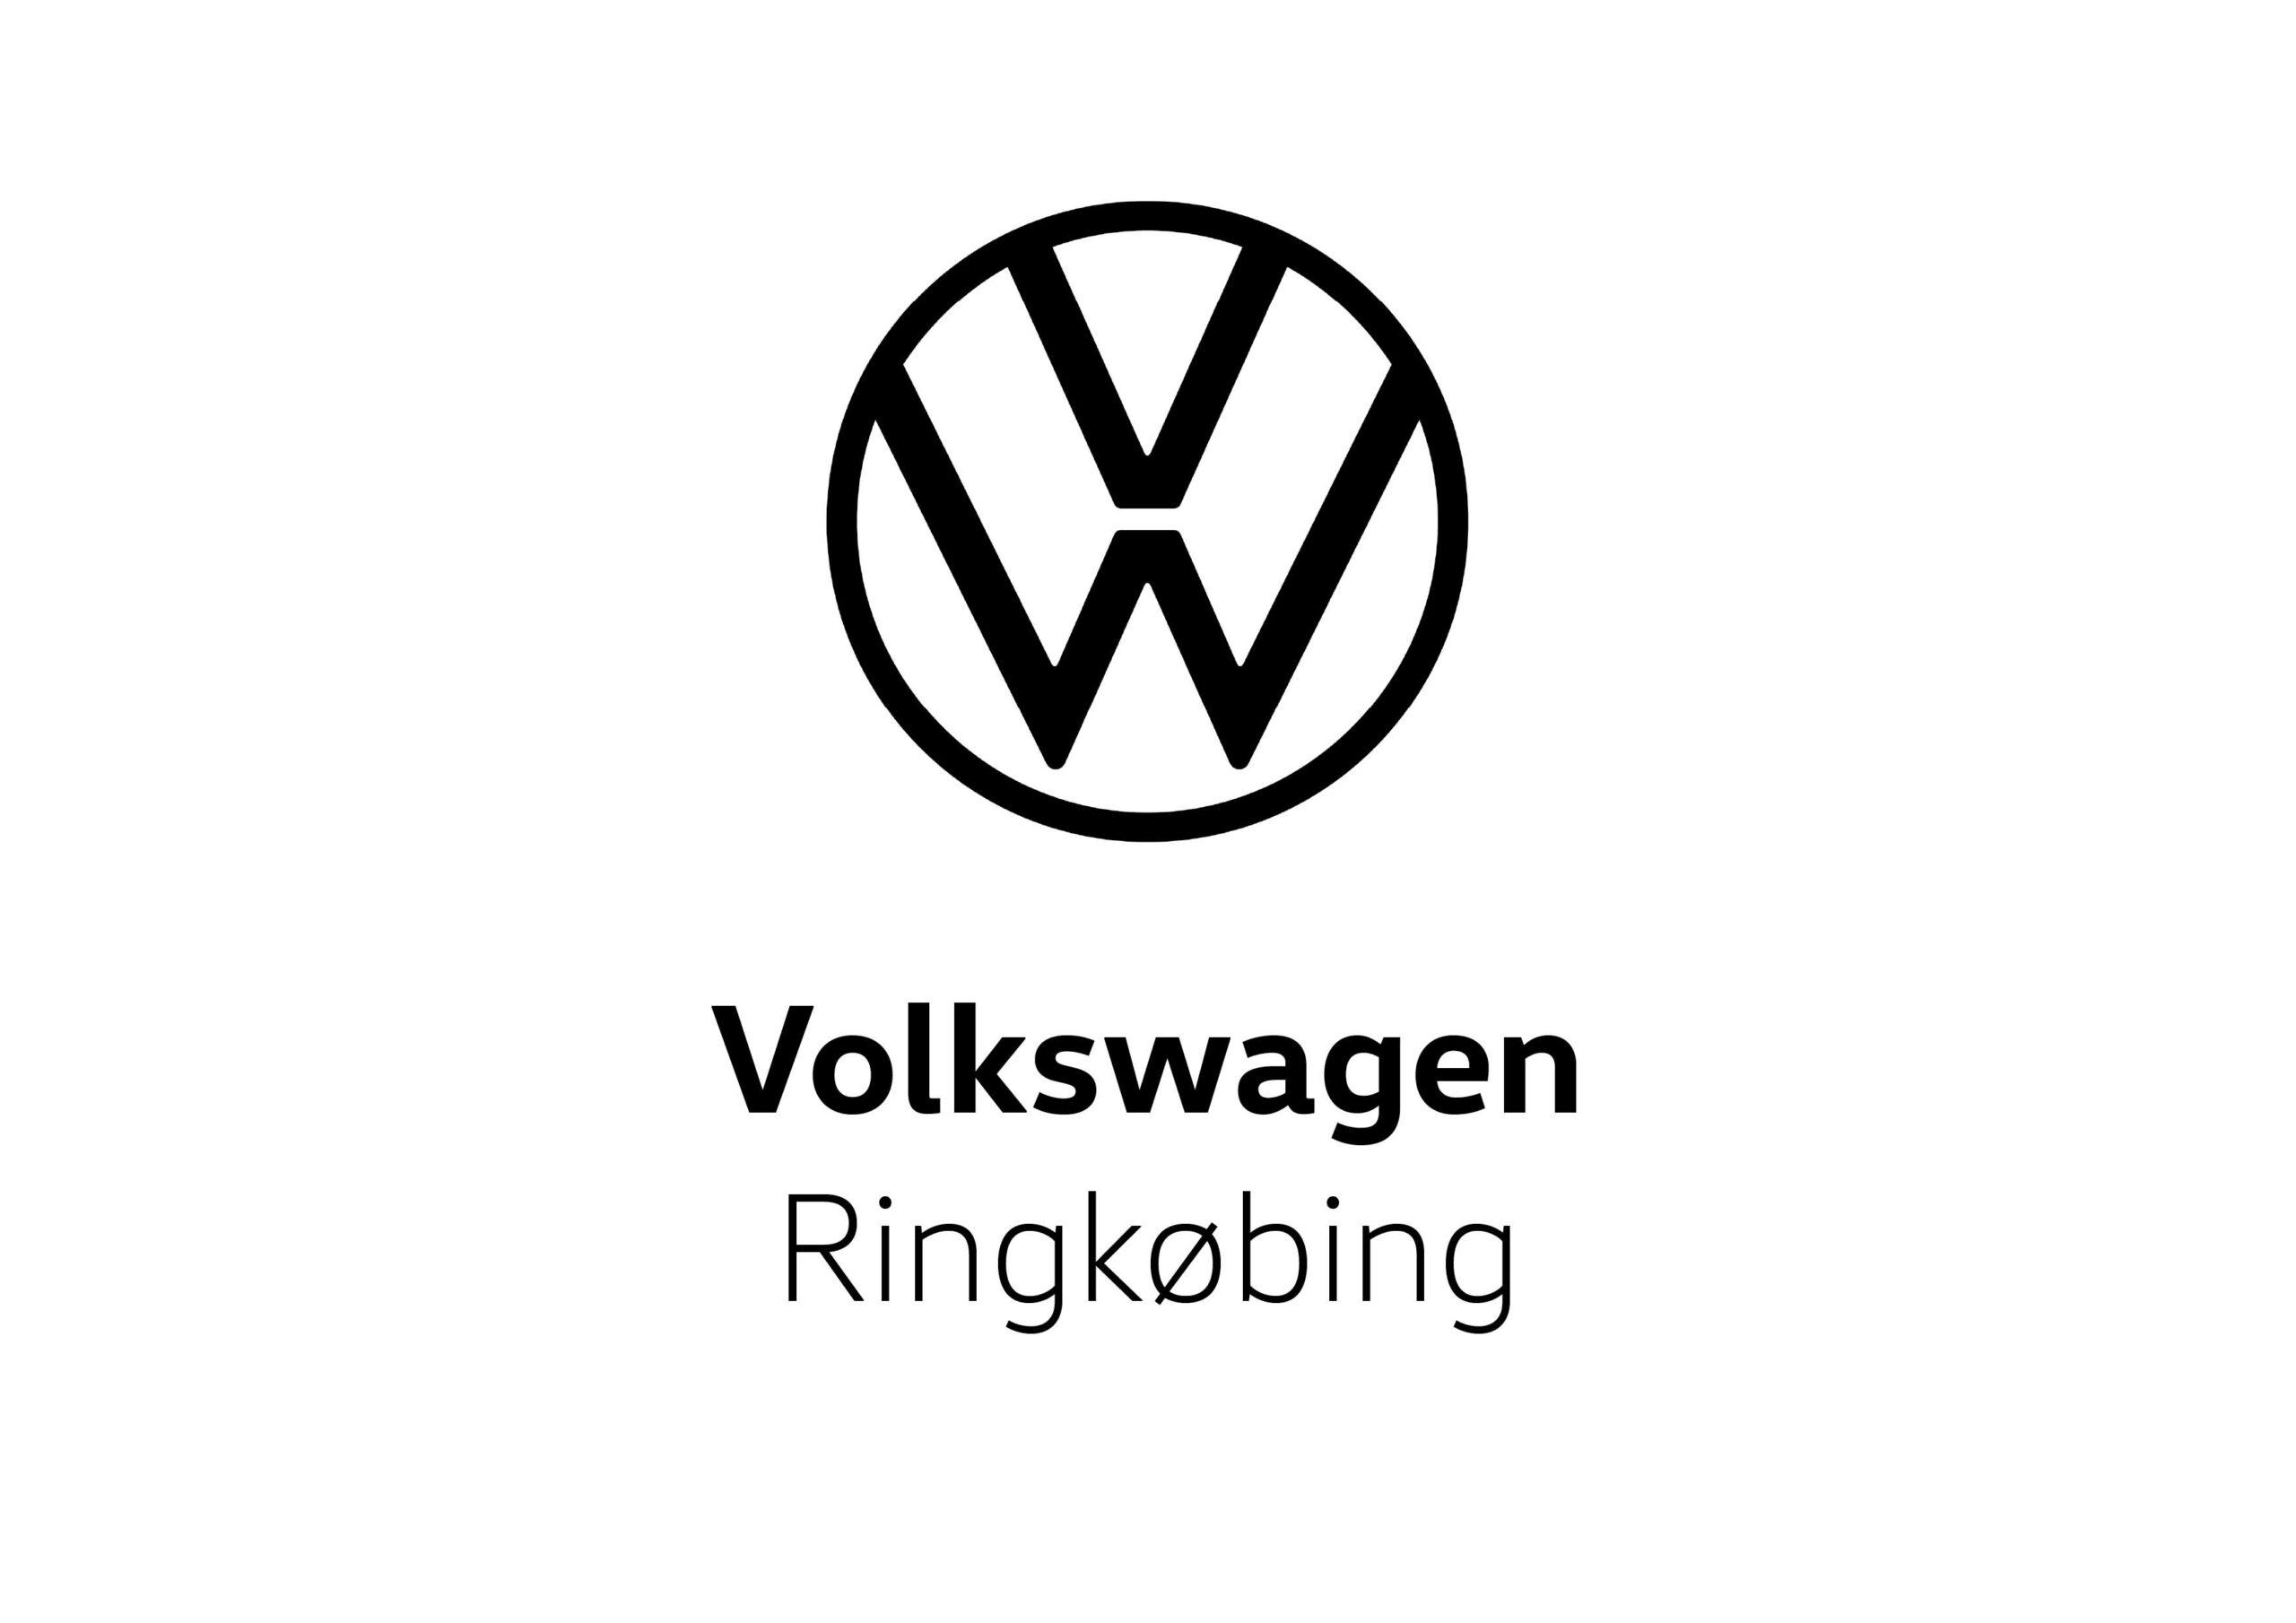 VW – A.V. Vejgaard